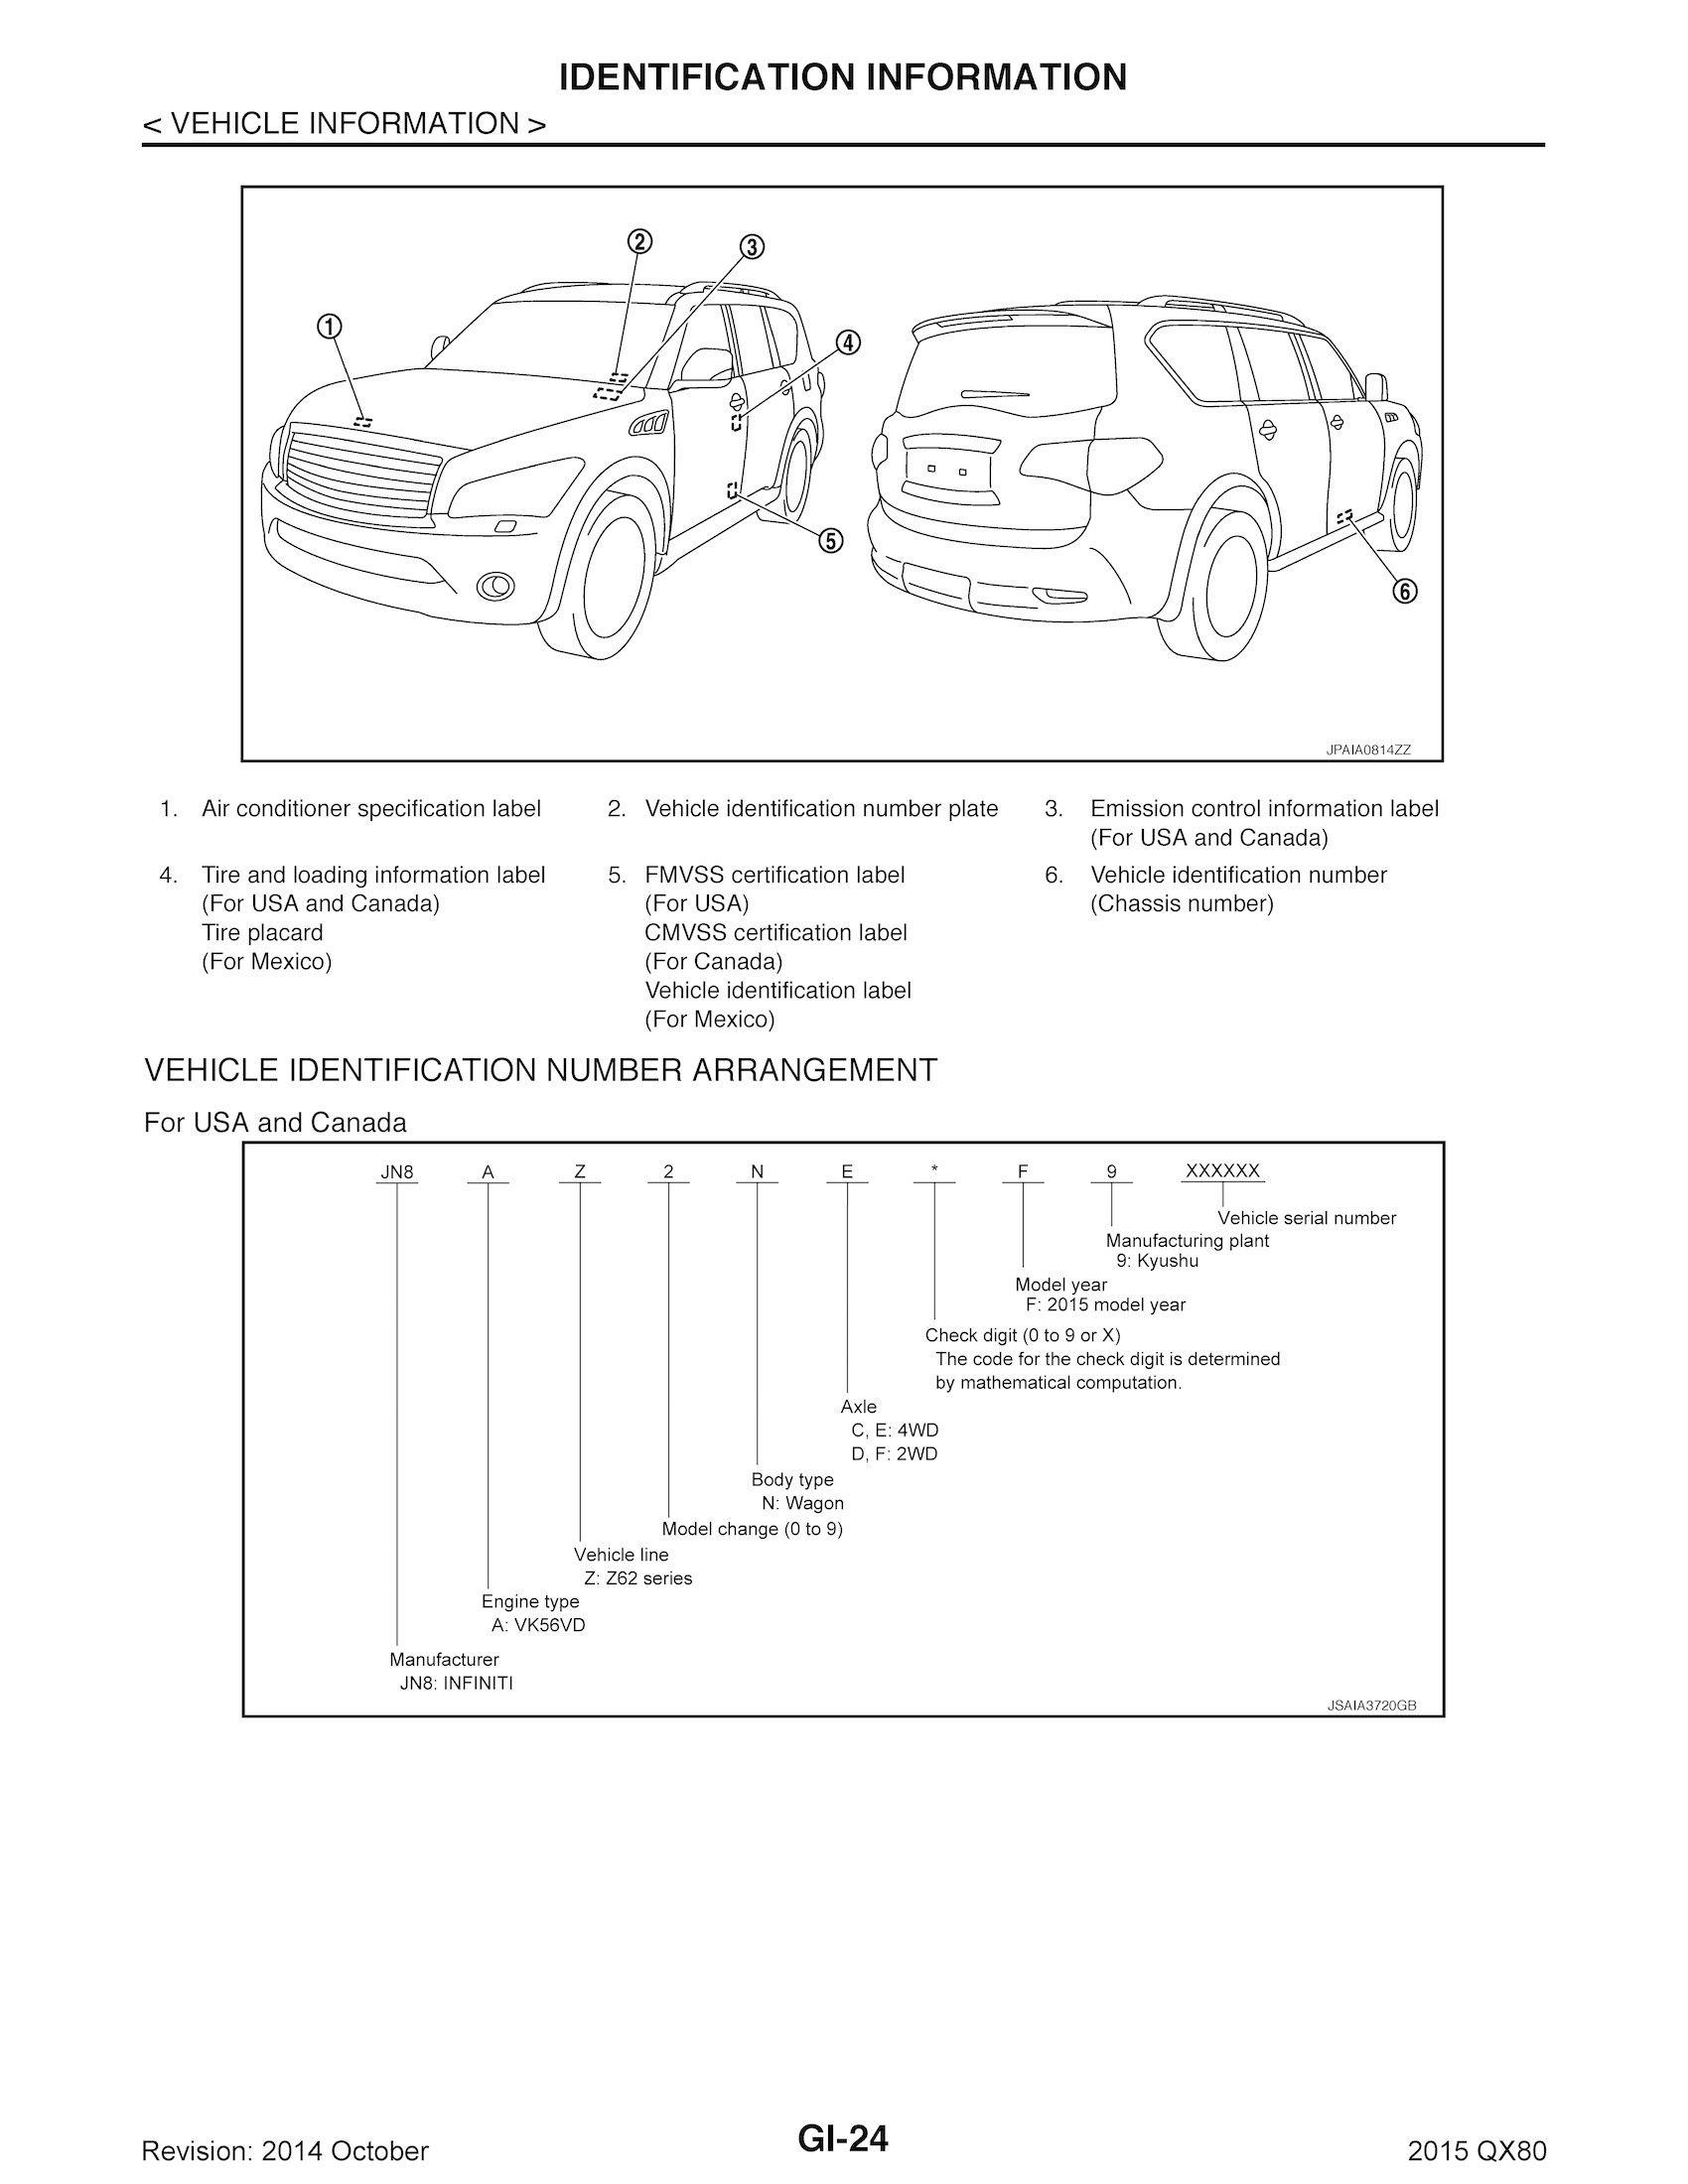 2015 infiniti qx80 oem service and repair manual needed it is 2015 infiniti qx80 oem service and repair manual solutioingenieria Choice Image